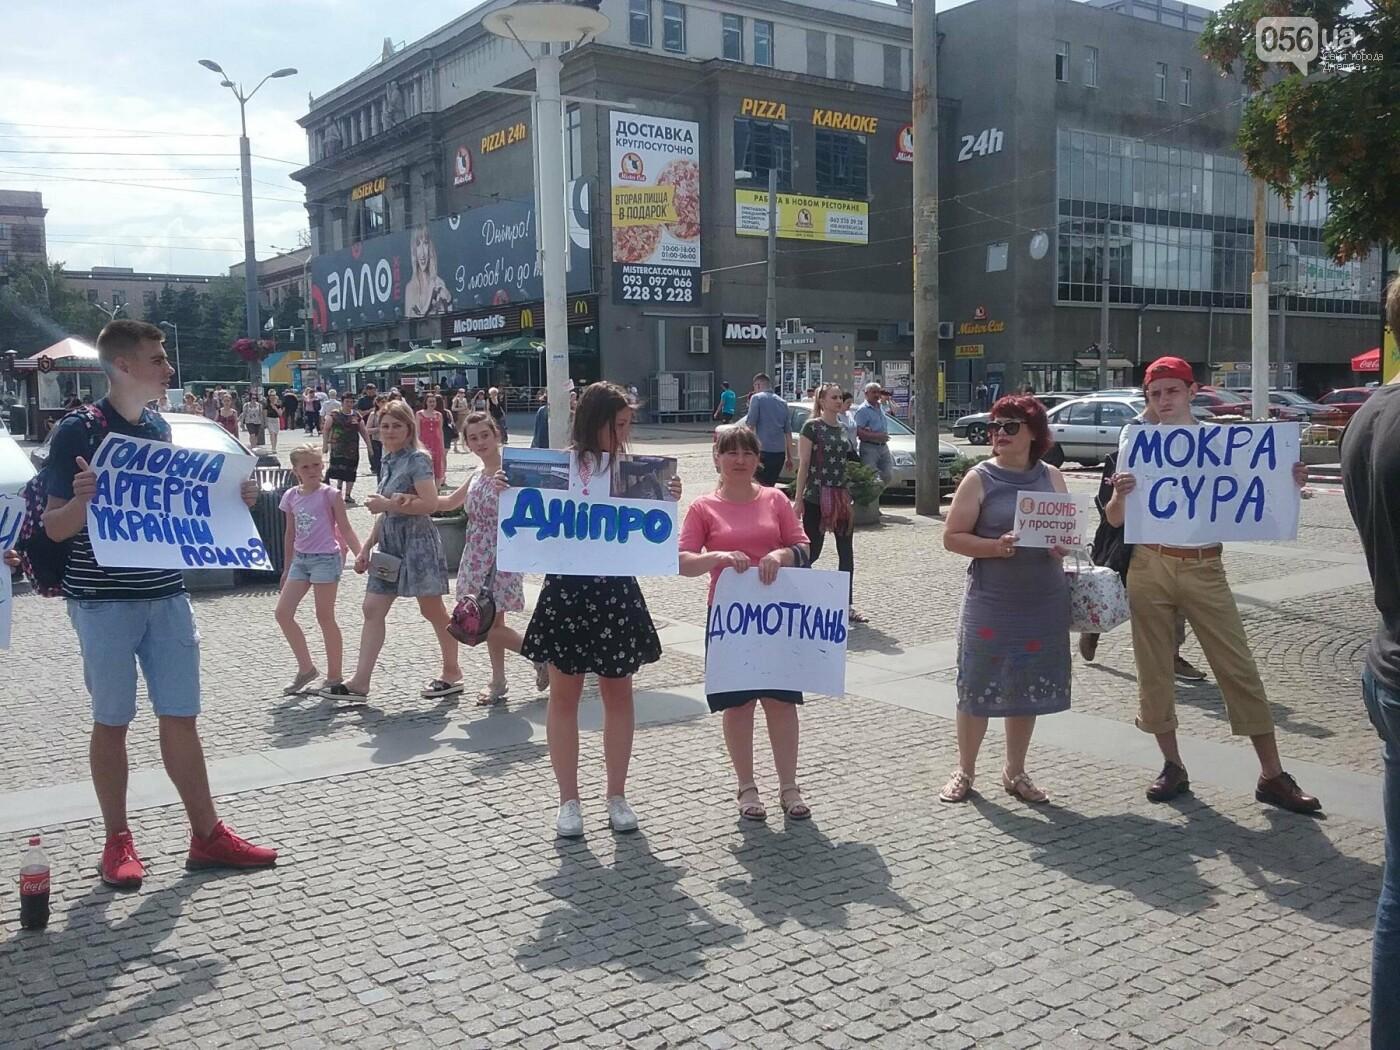 Спаси реку Днепр: как прошел экологический флешмоб, - ФОТО, фото-2